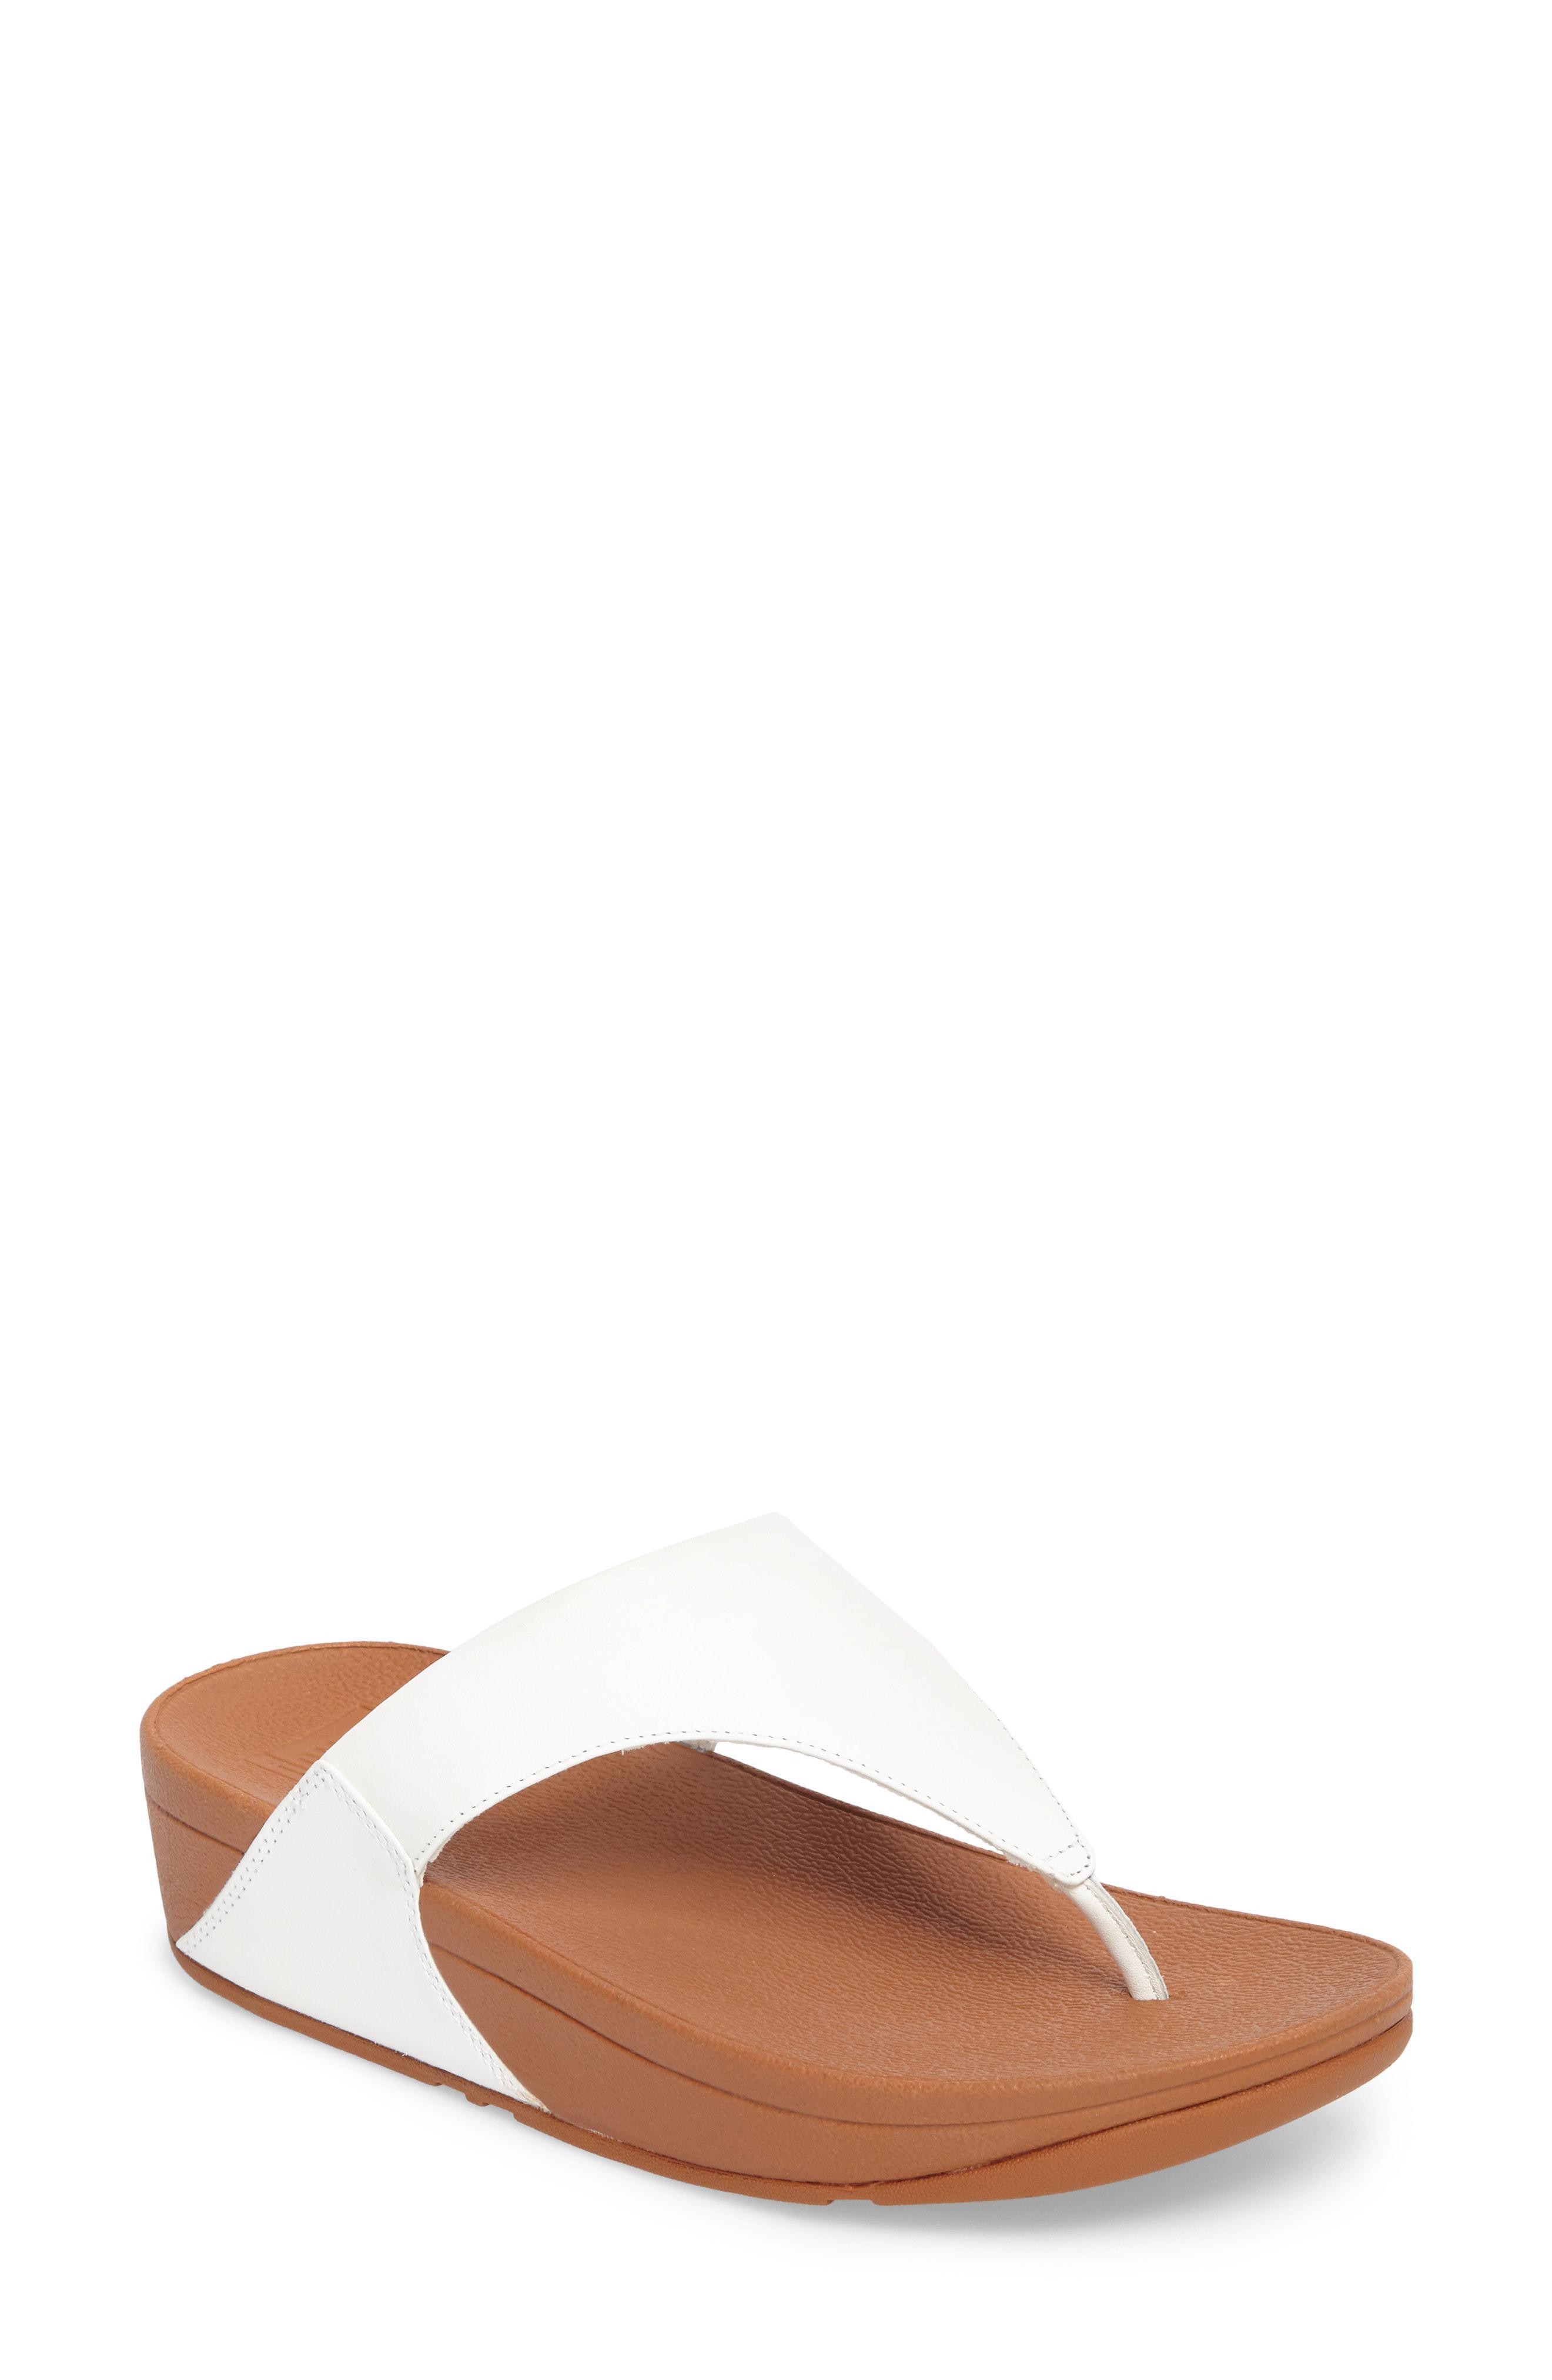 68da623bf61 Lyst - Fitflop White Leather  lulu  Mid Flatform Heel Flip Flops in ...